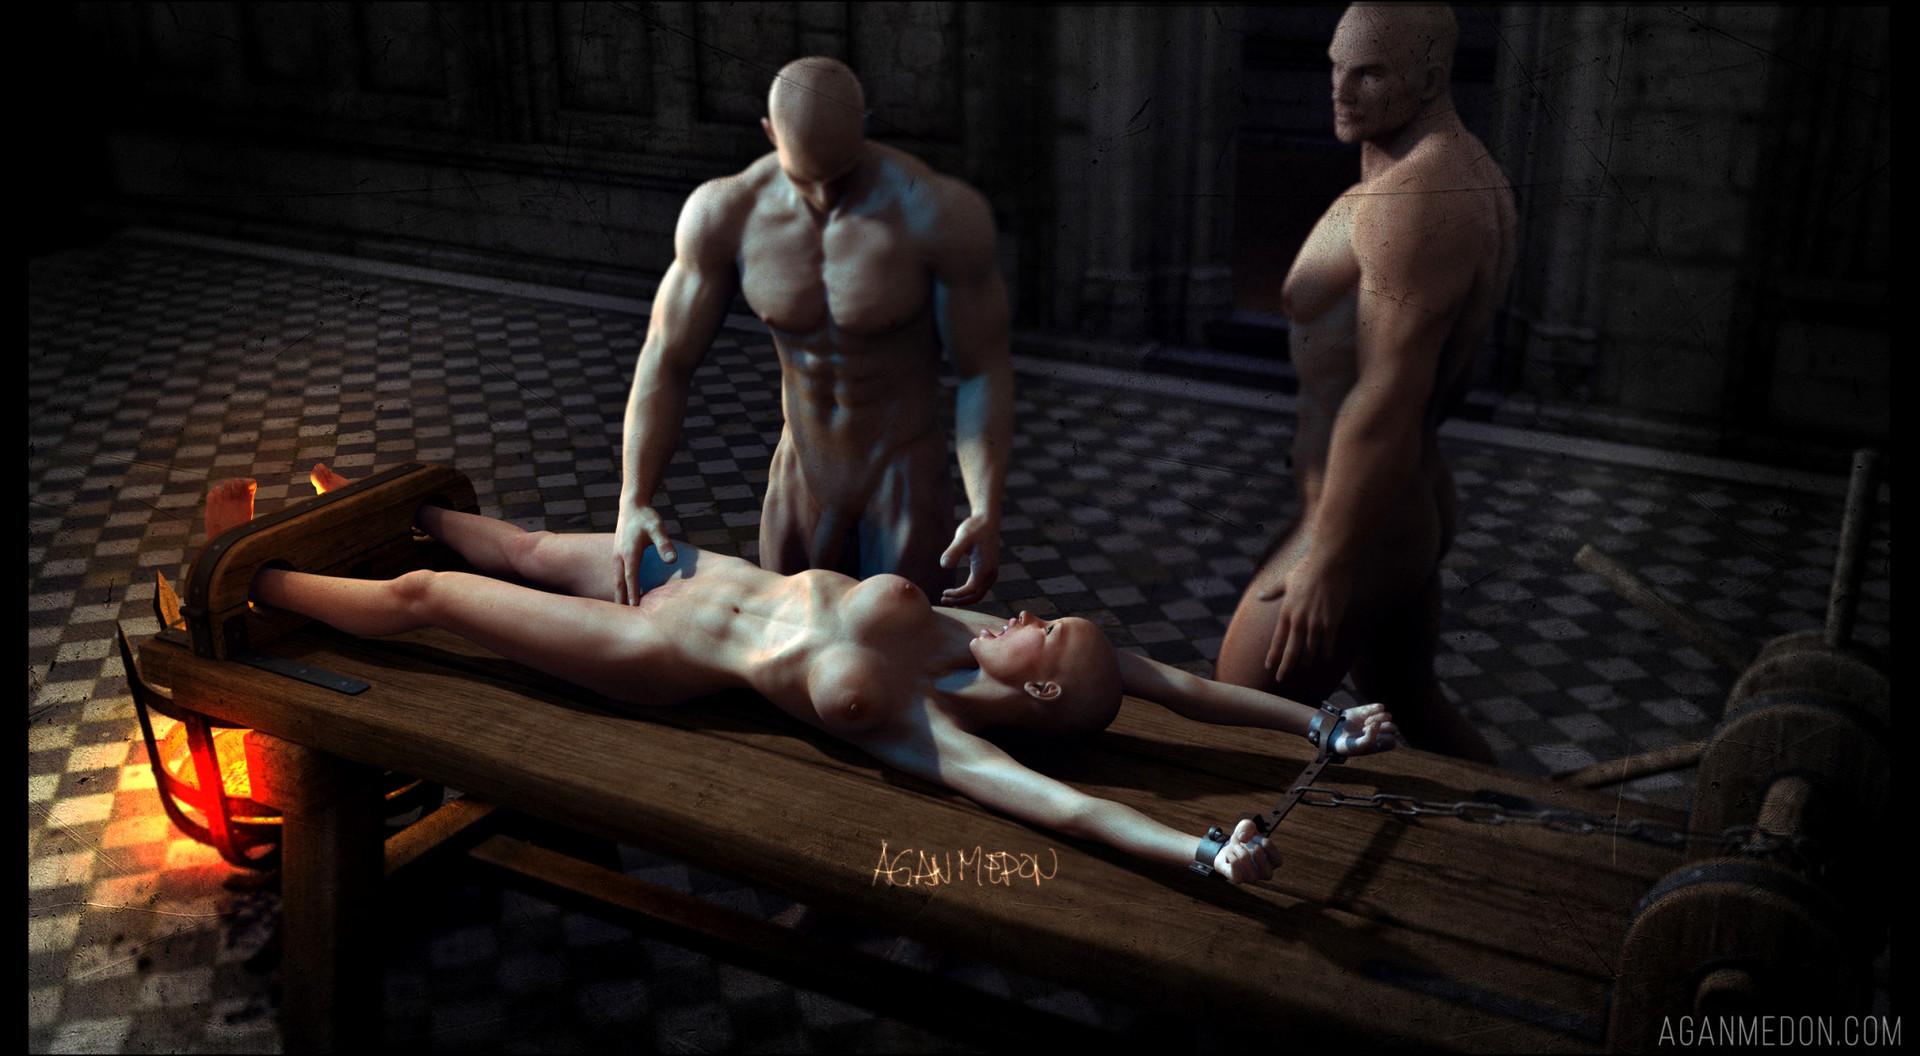 Panish inquisition women torture rack pics